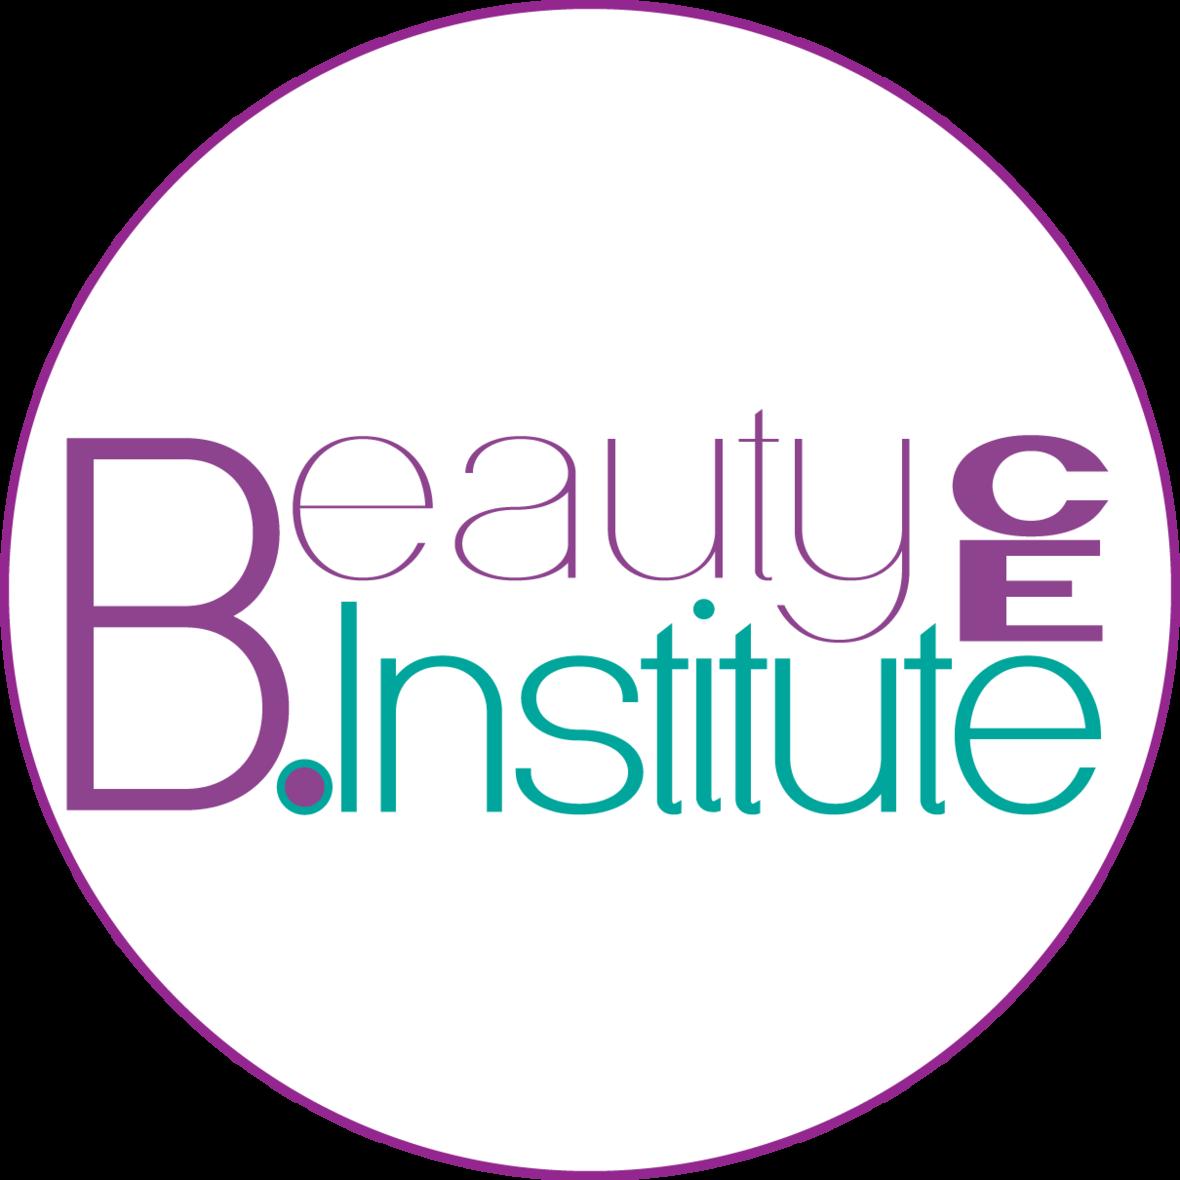 BeautyCE Profile Logo